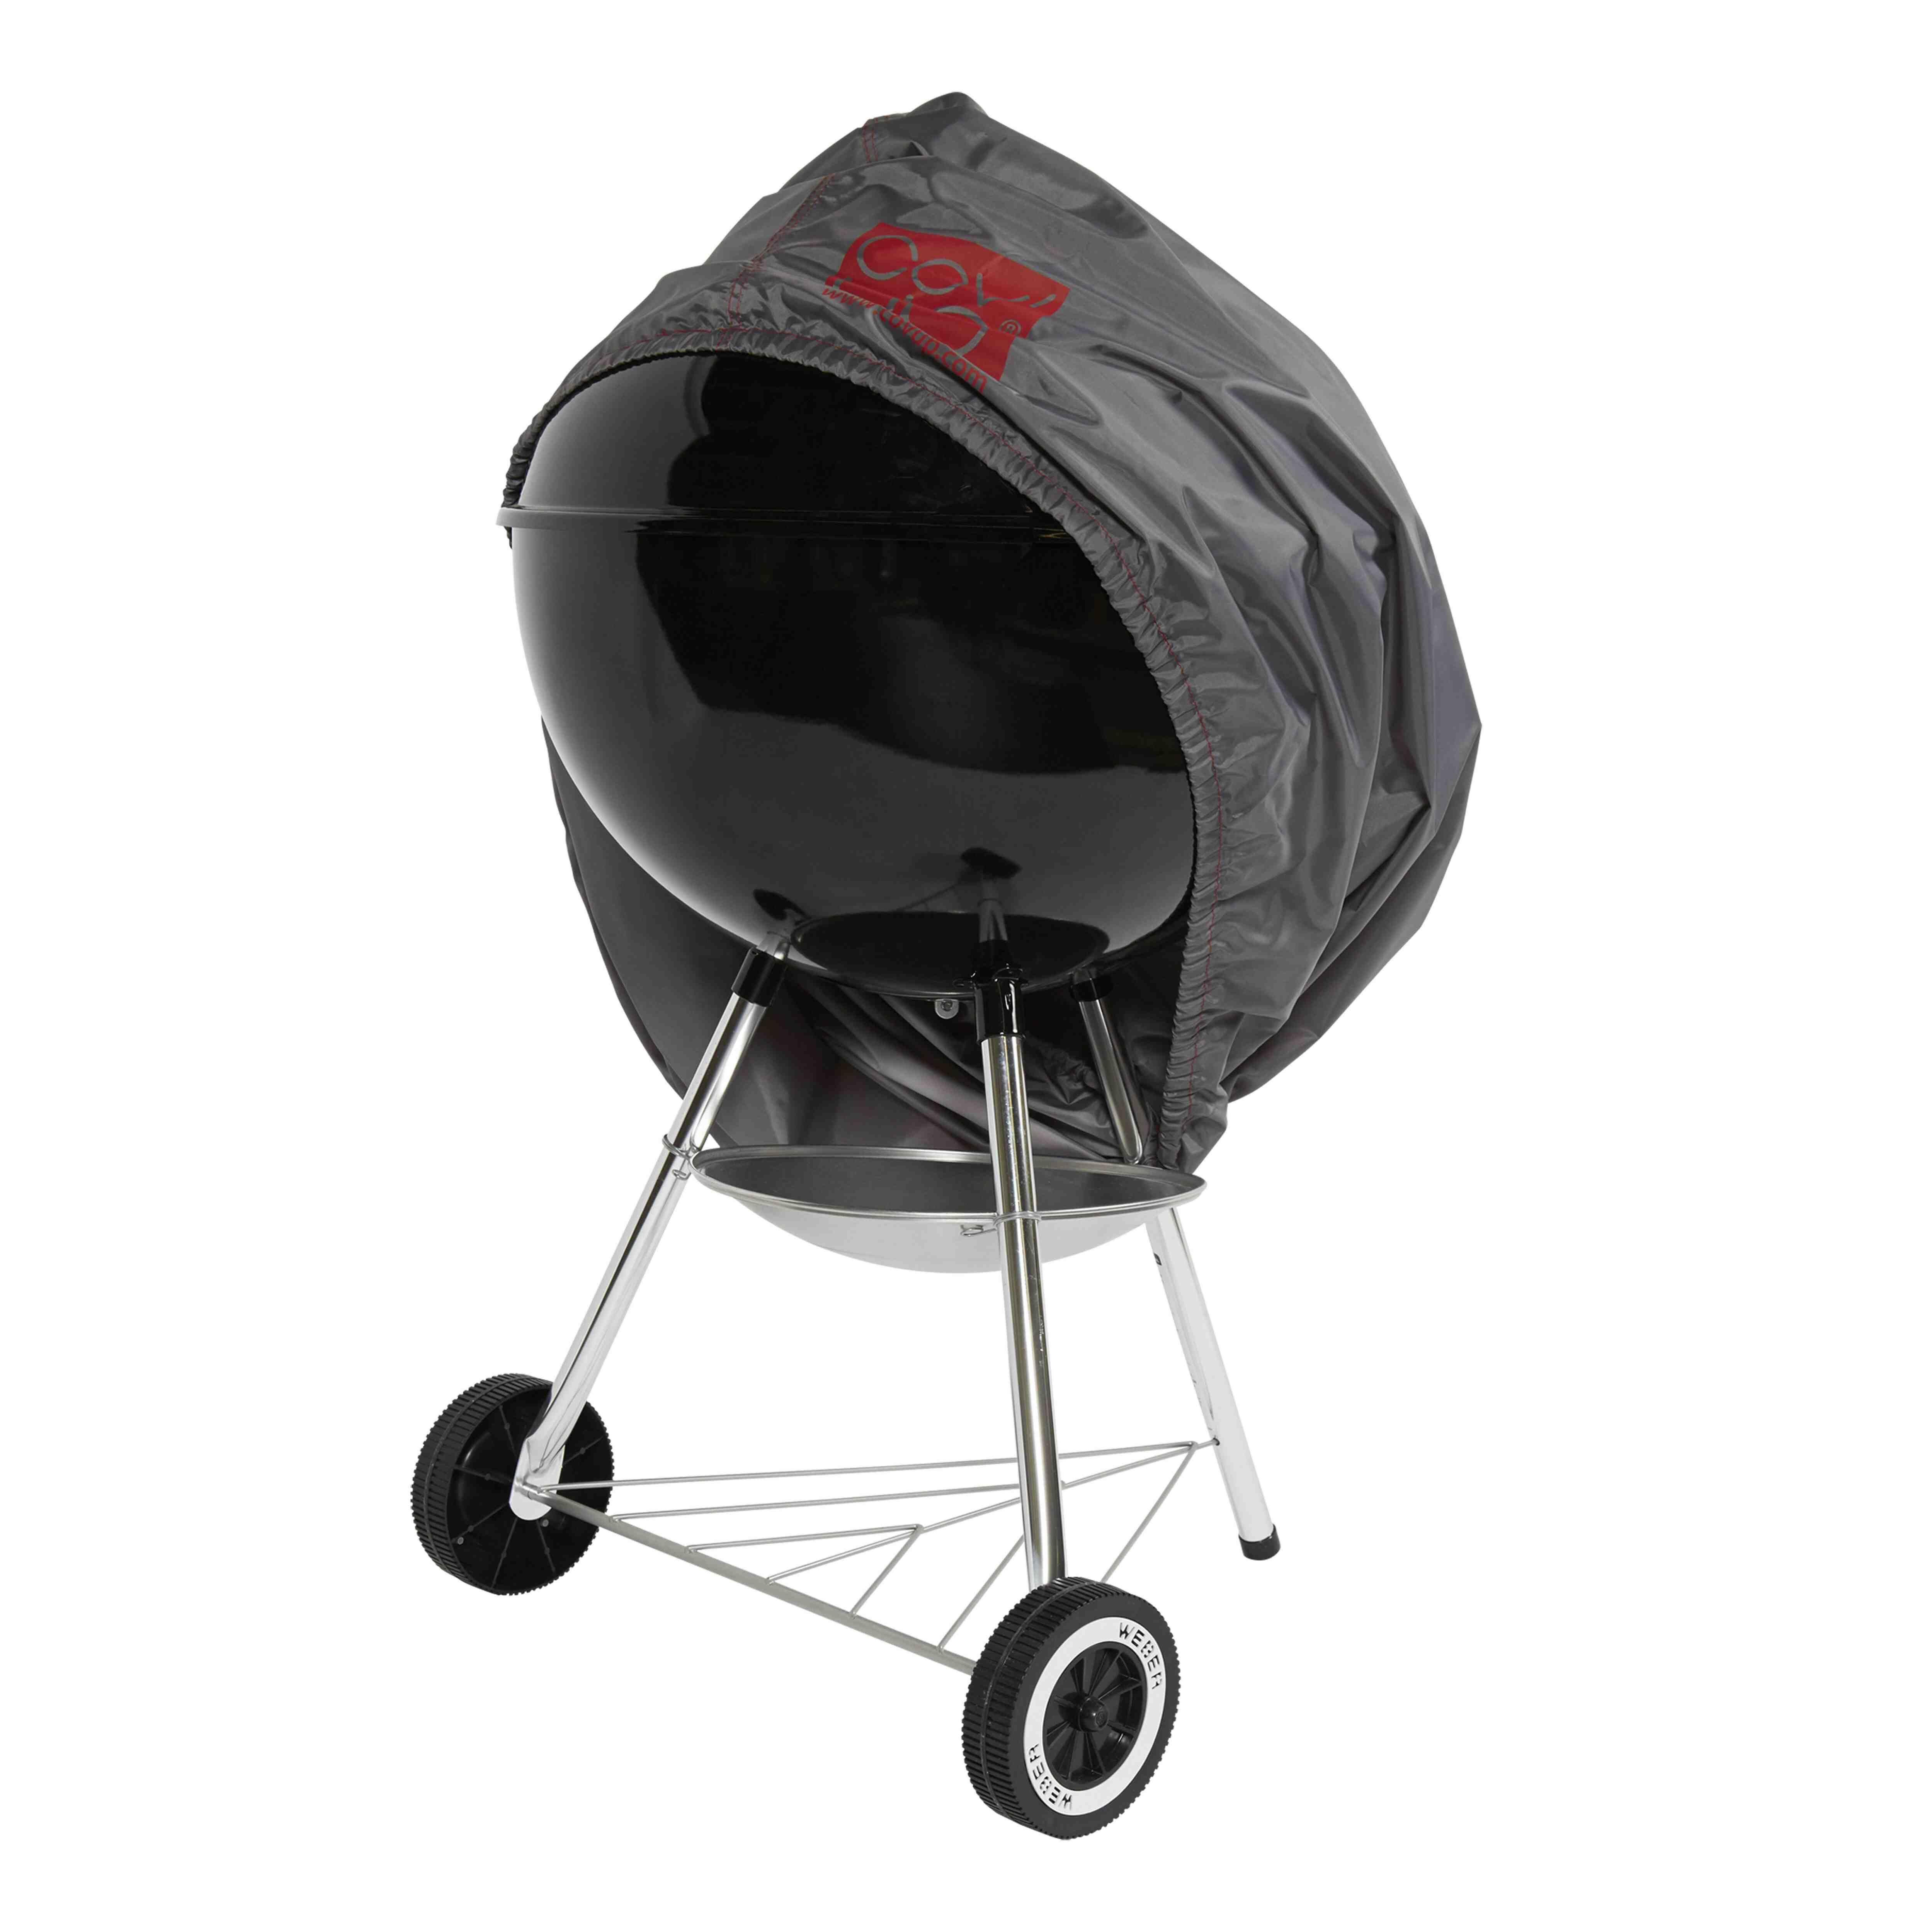 Housse de protection pour Barbecue en polyester gris